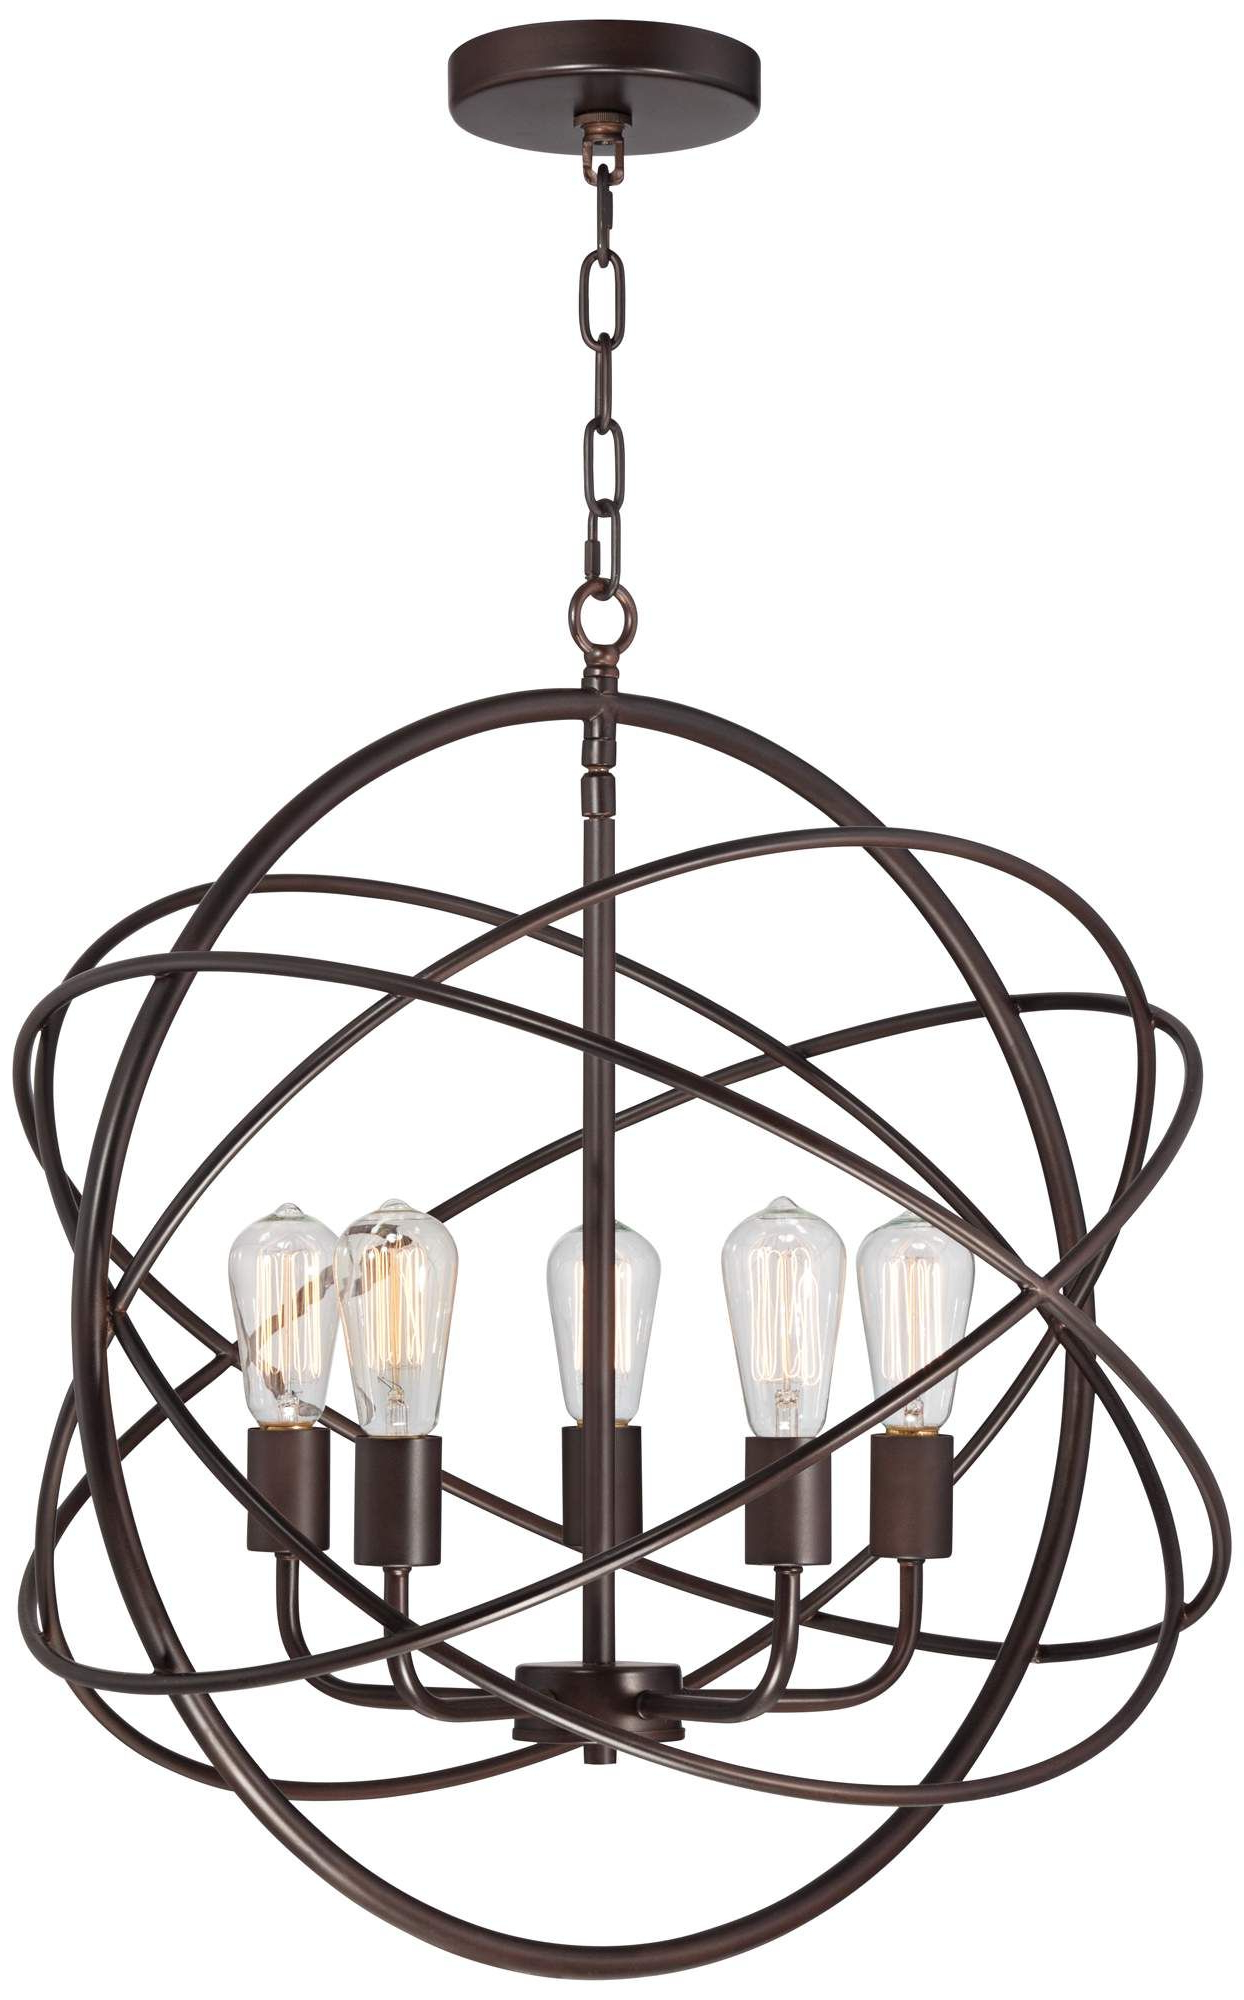 "Kierra 4 Light Unique / Statement Chandeliers Regarding Trendy Ellery 24 3/4"" Wide 5 Light Bronze Sphere Foyer Pendant In (Gallery 9 of 25)"